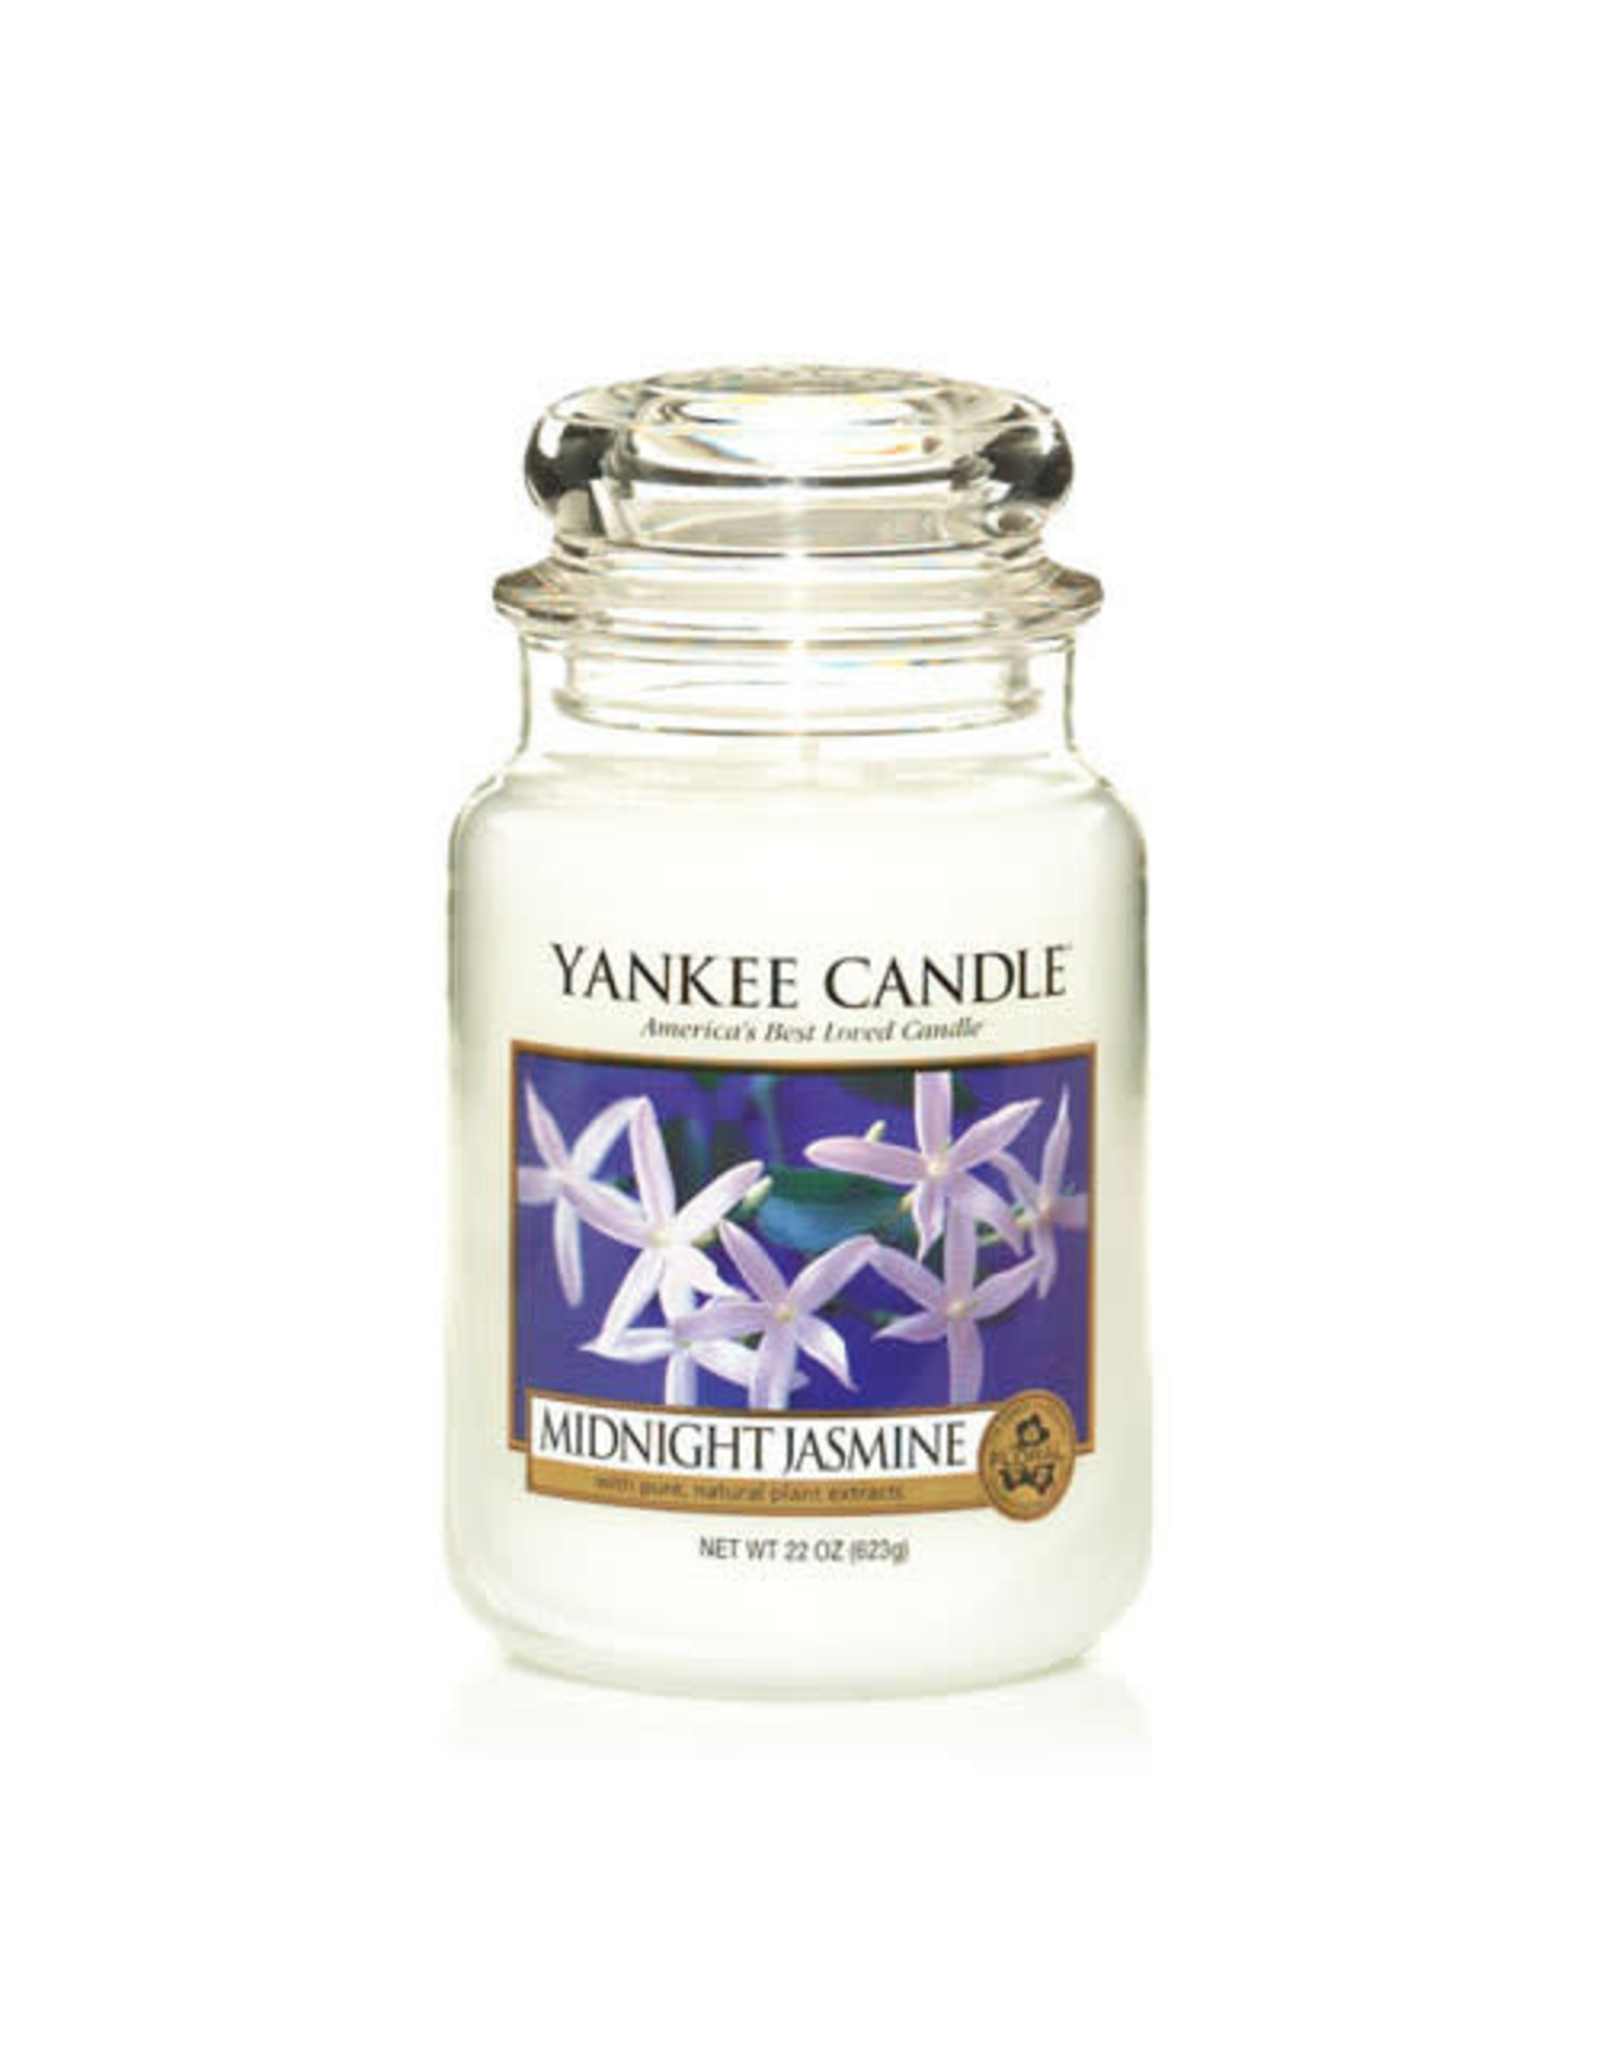 Yankee Candle Midnight Jasmine Yankee Candle